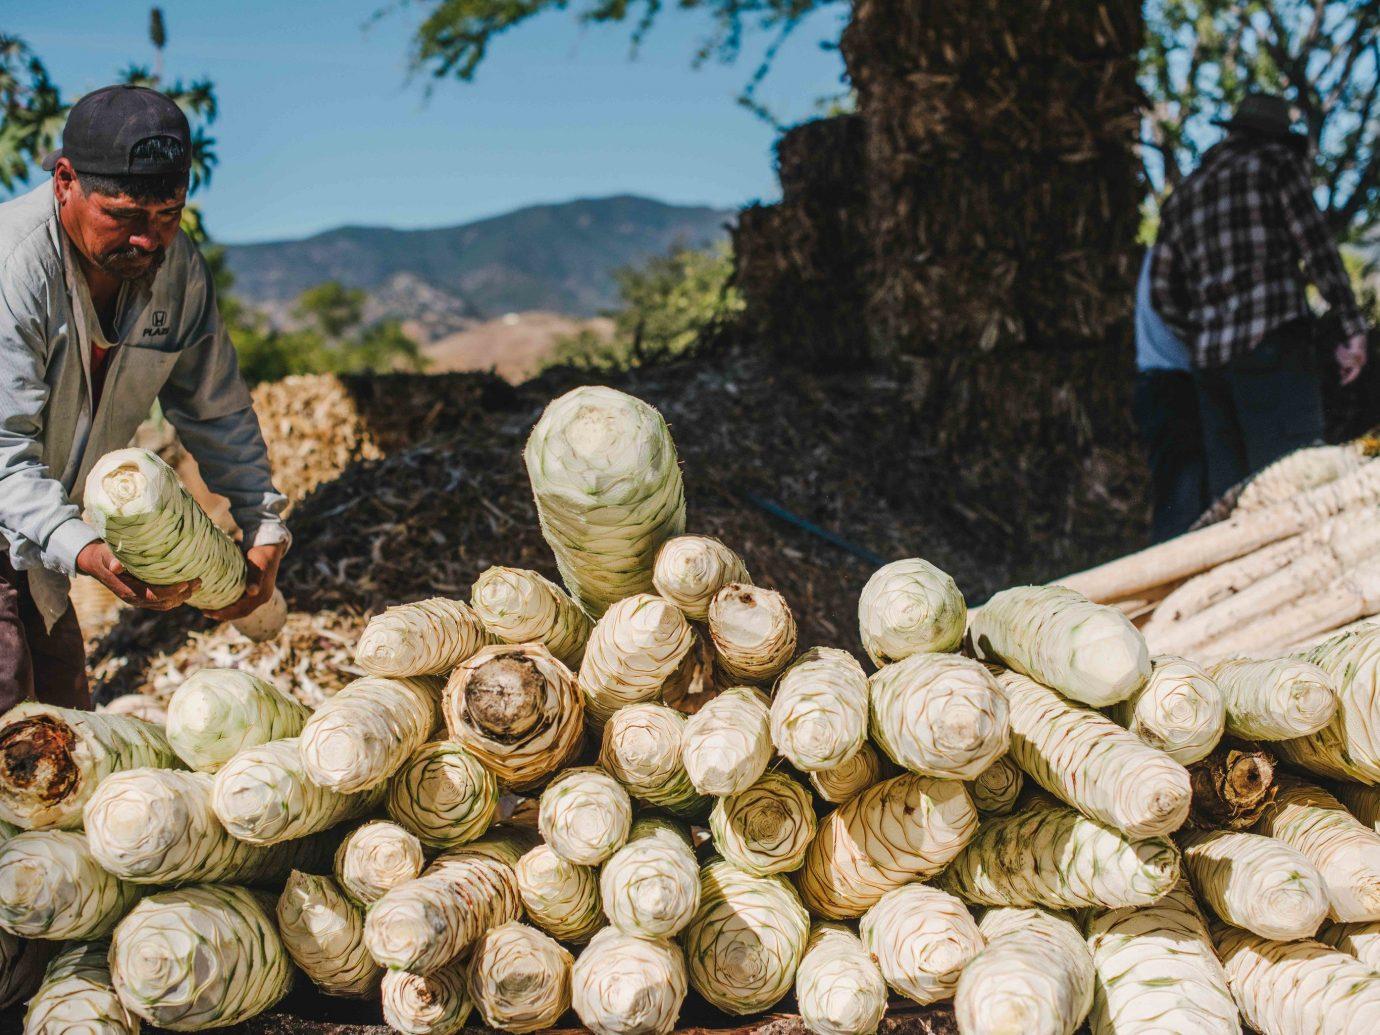 Arts + Culture Mexico Oaxaca Trip Ideas produce vegetable plant local food food